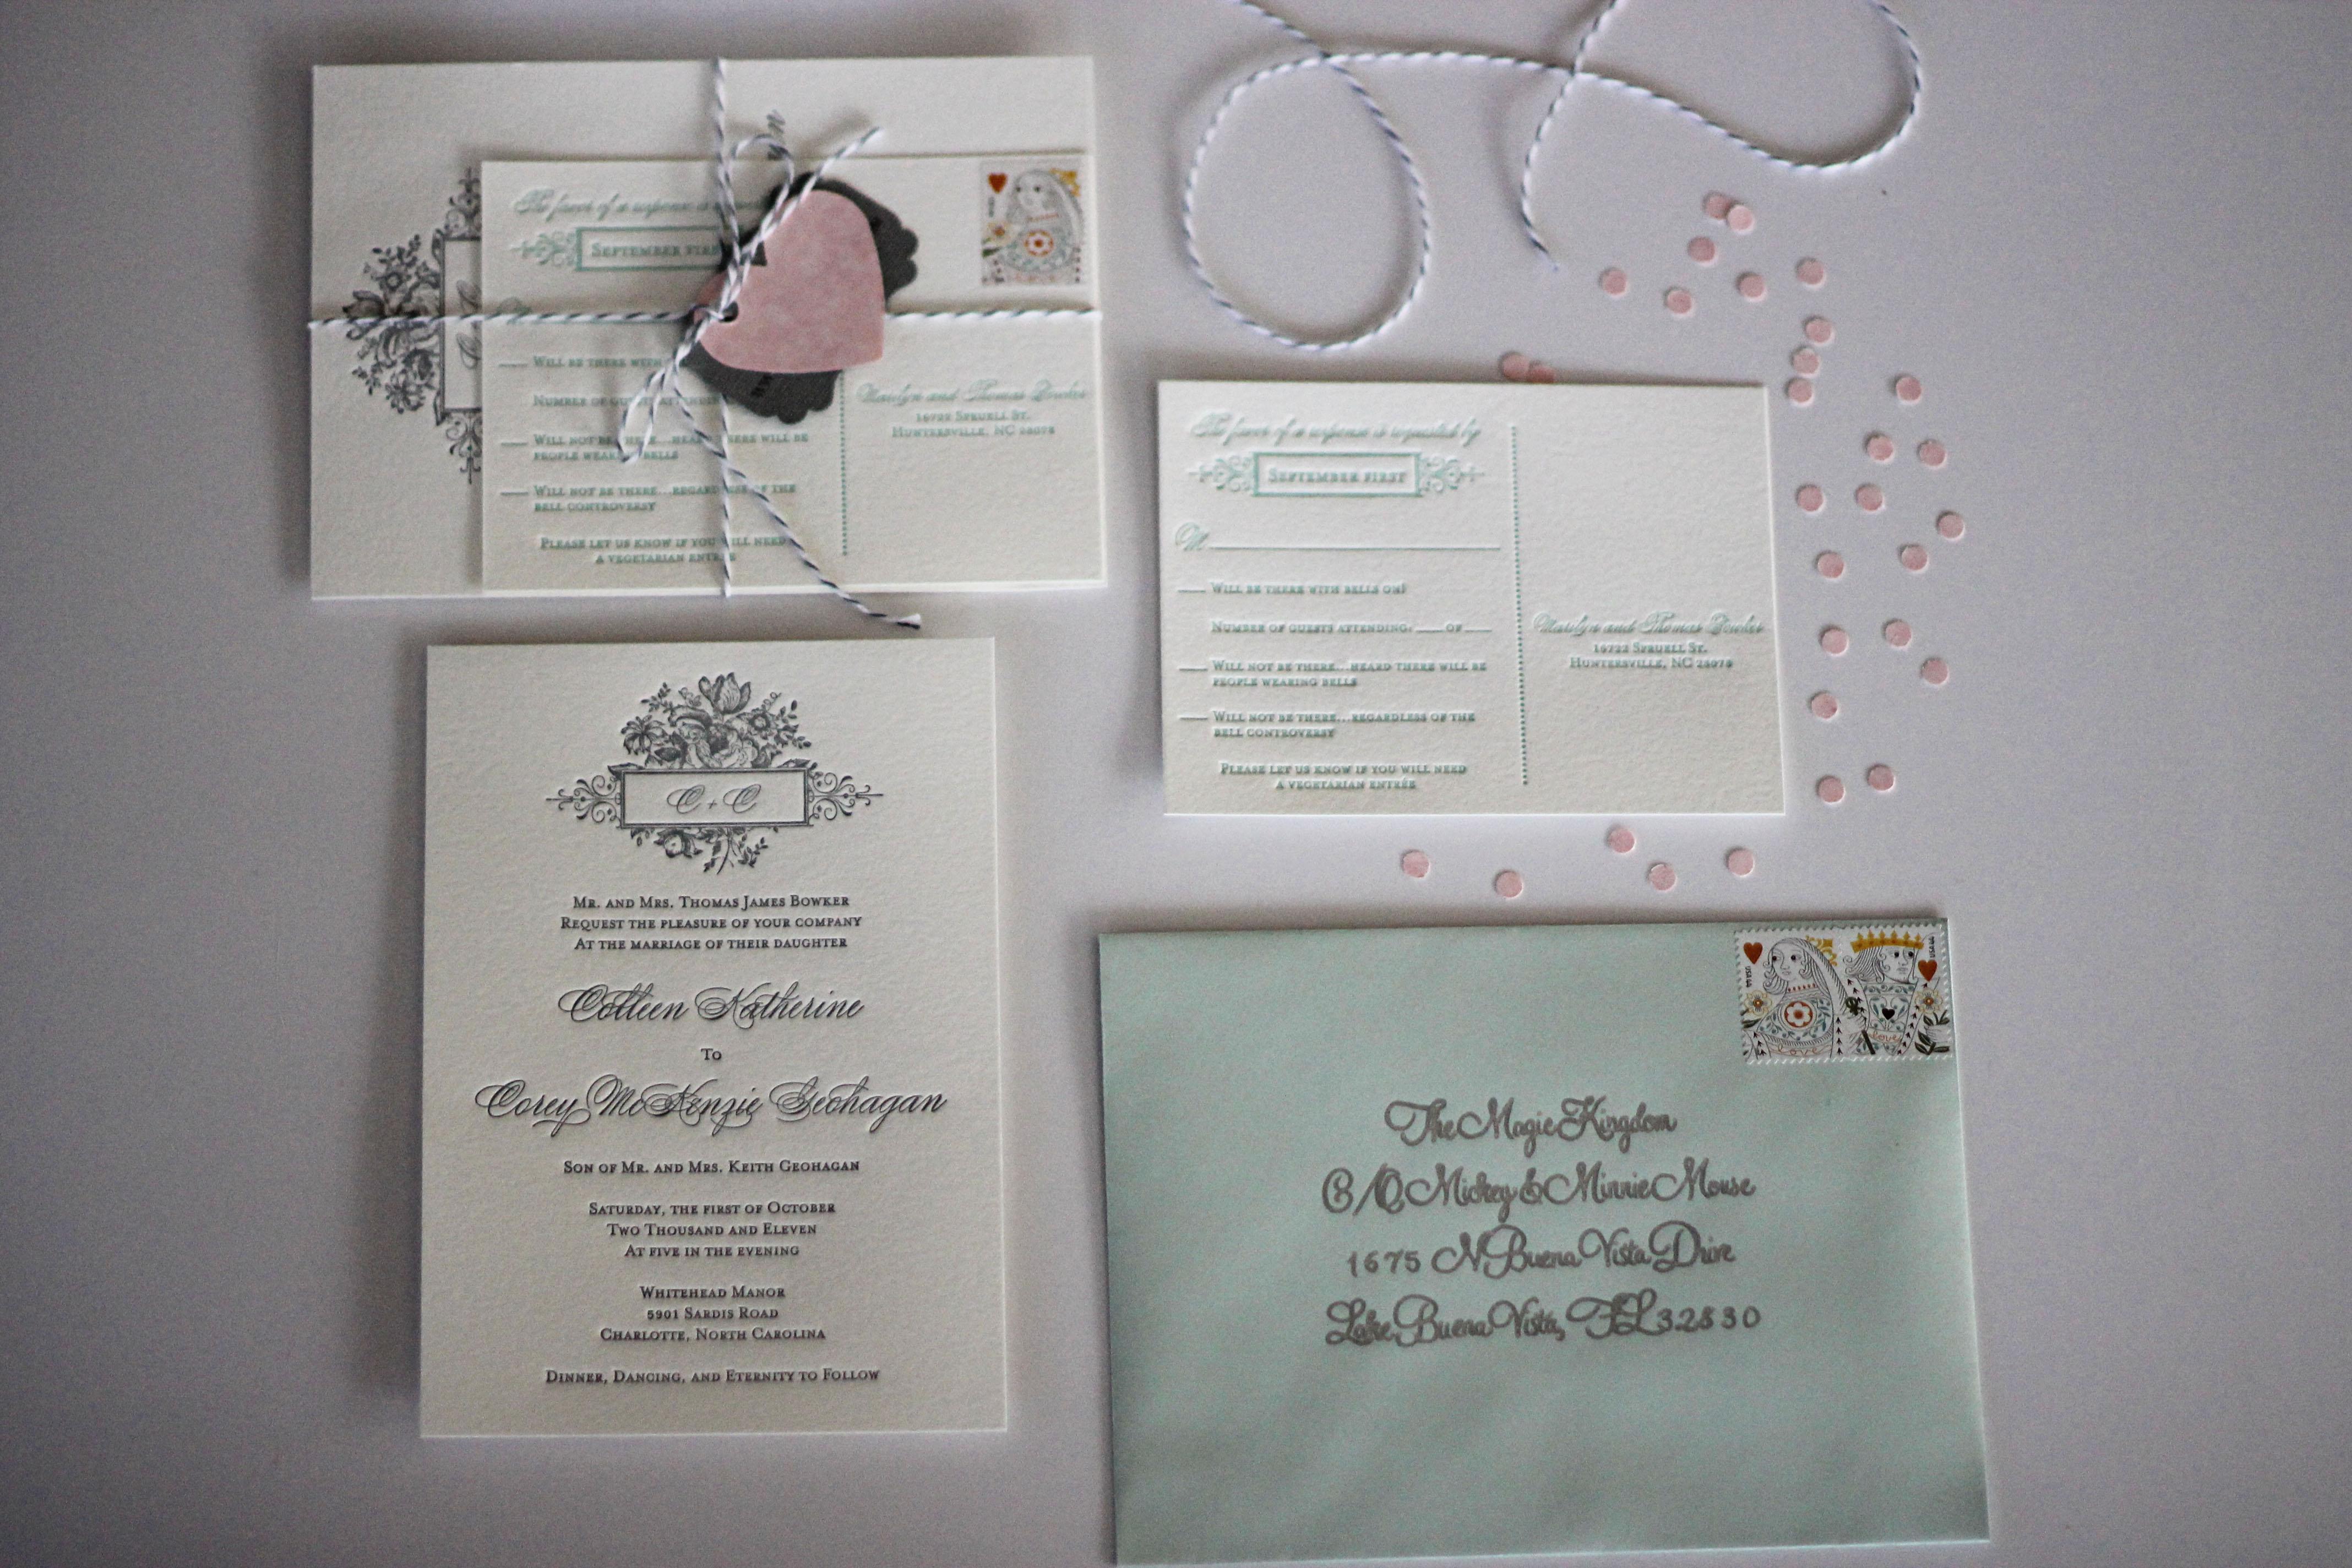 Diy Addressing Wedding Invitations: Fancying Up Your Wedding Invitations {DIY}